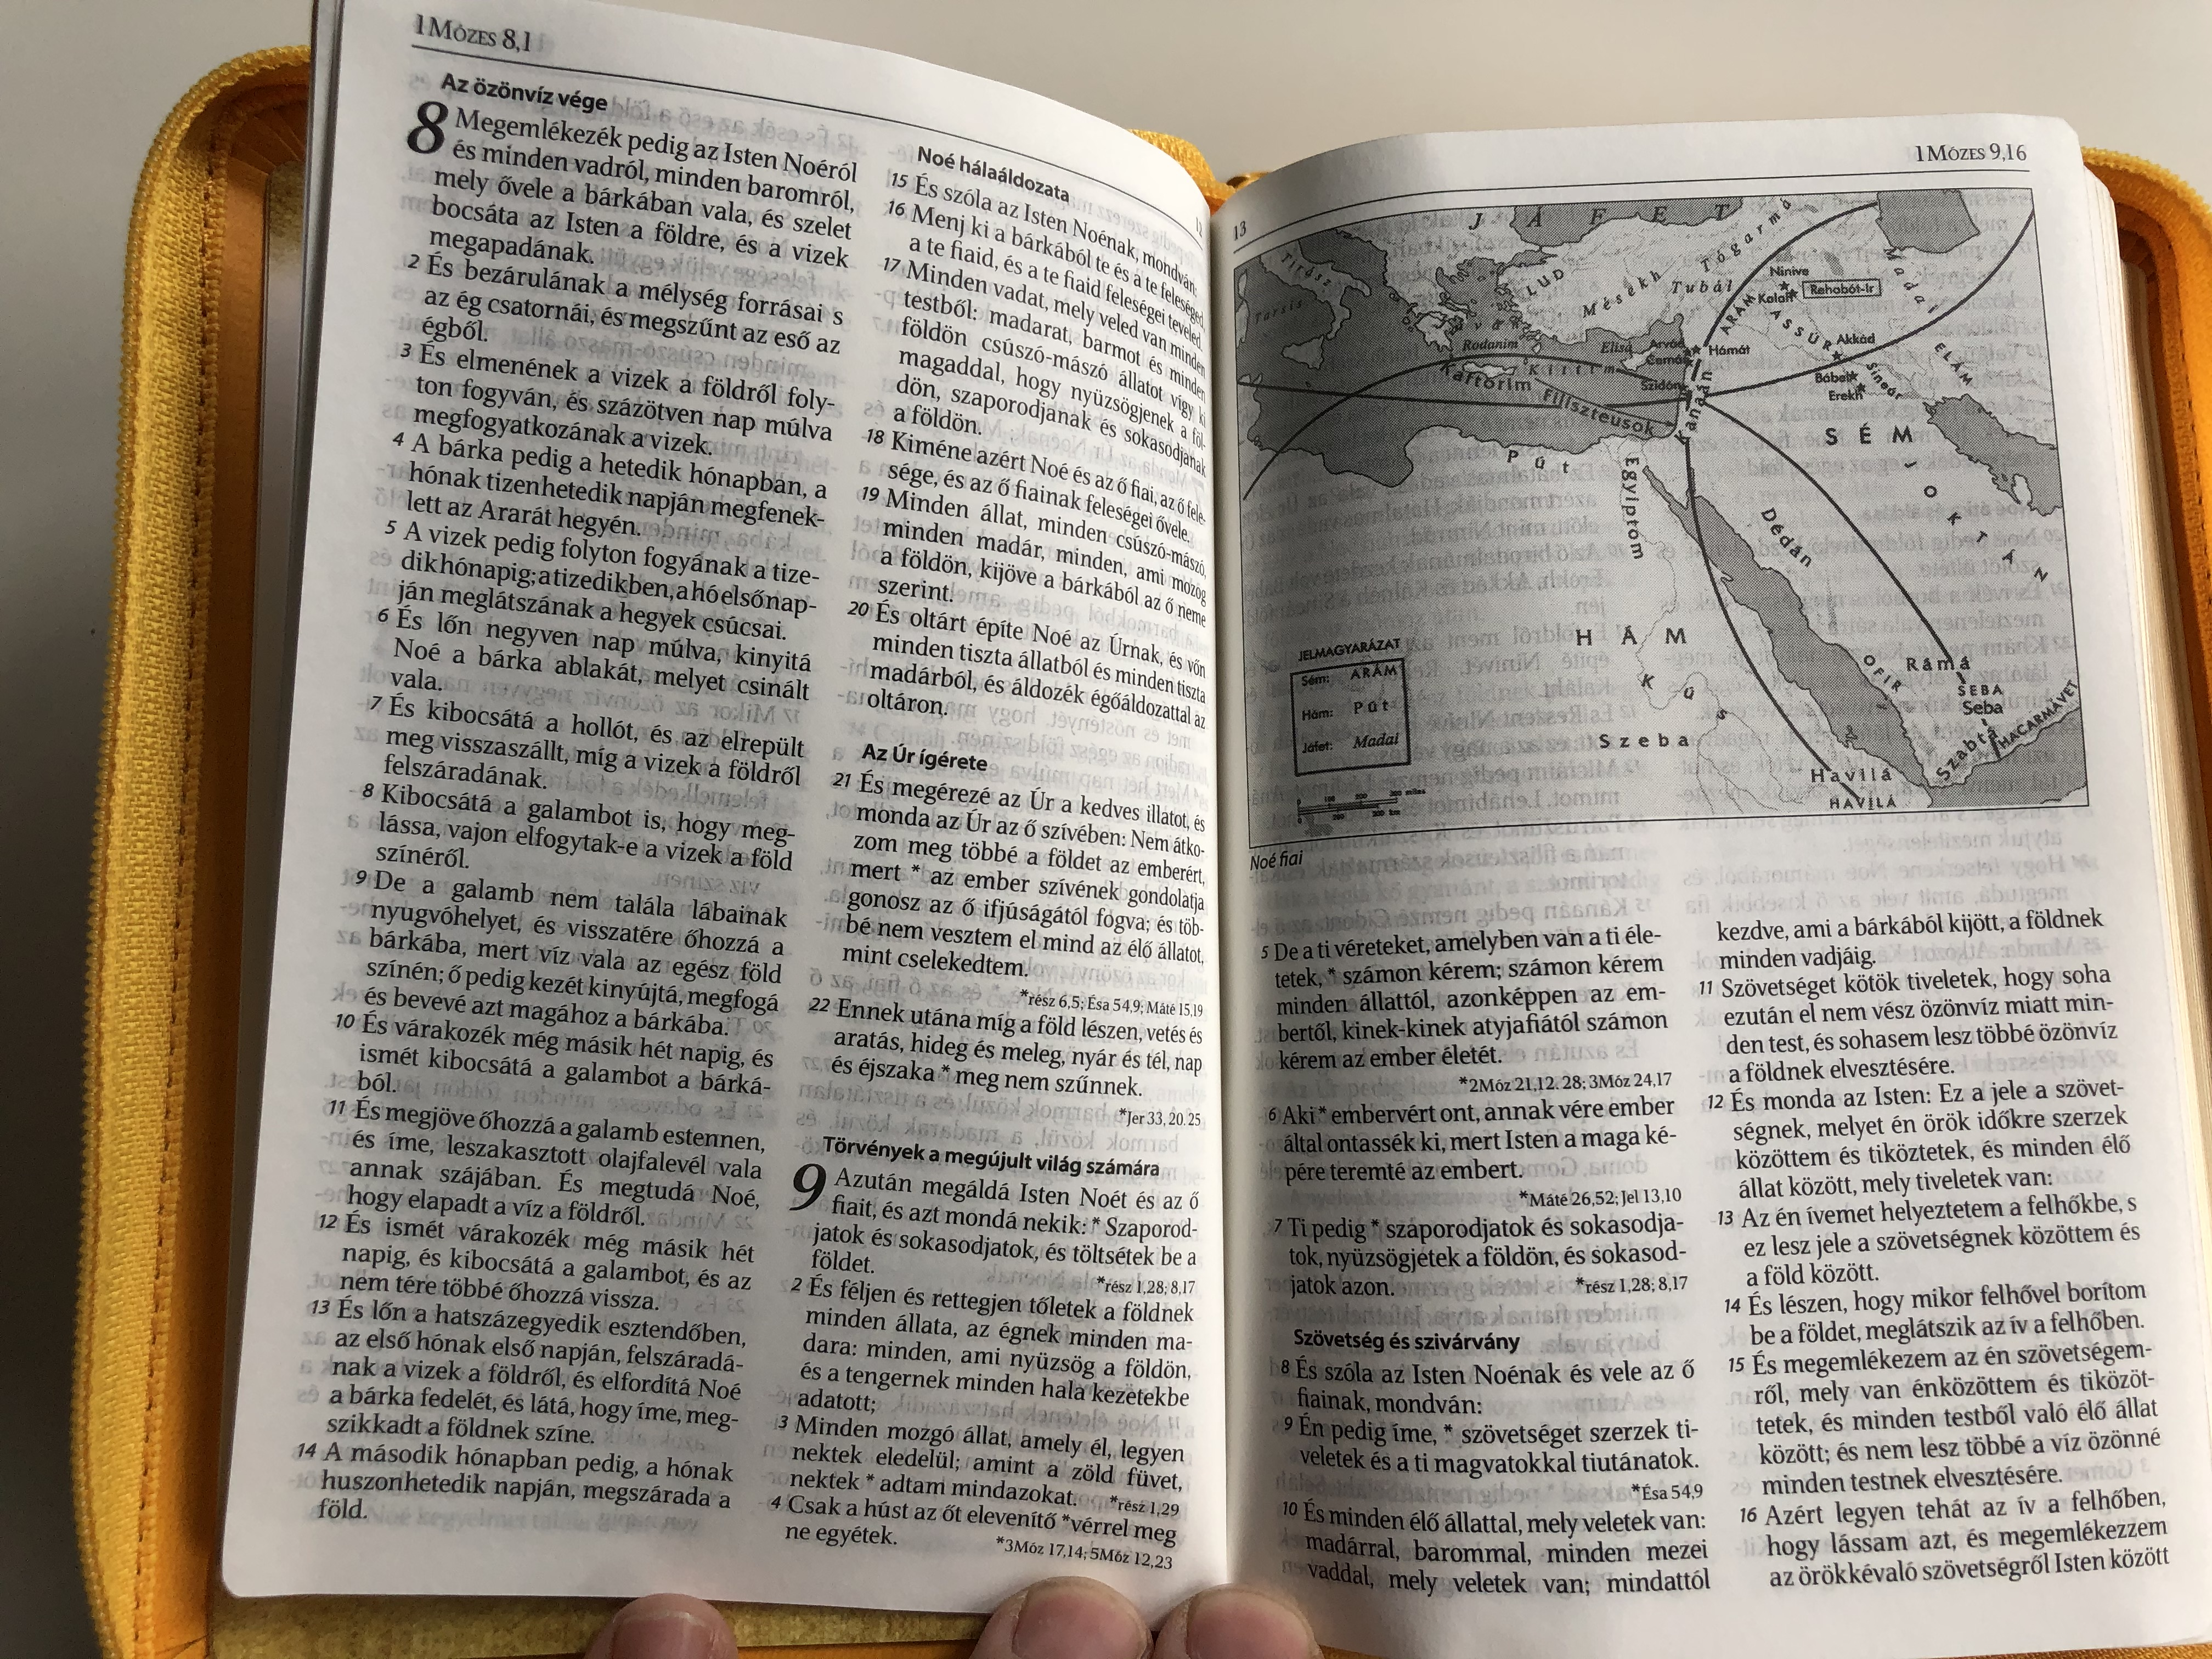 holy-bible-szent-biblia-k-roli-g-sp-r-mall-size-5.jpg